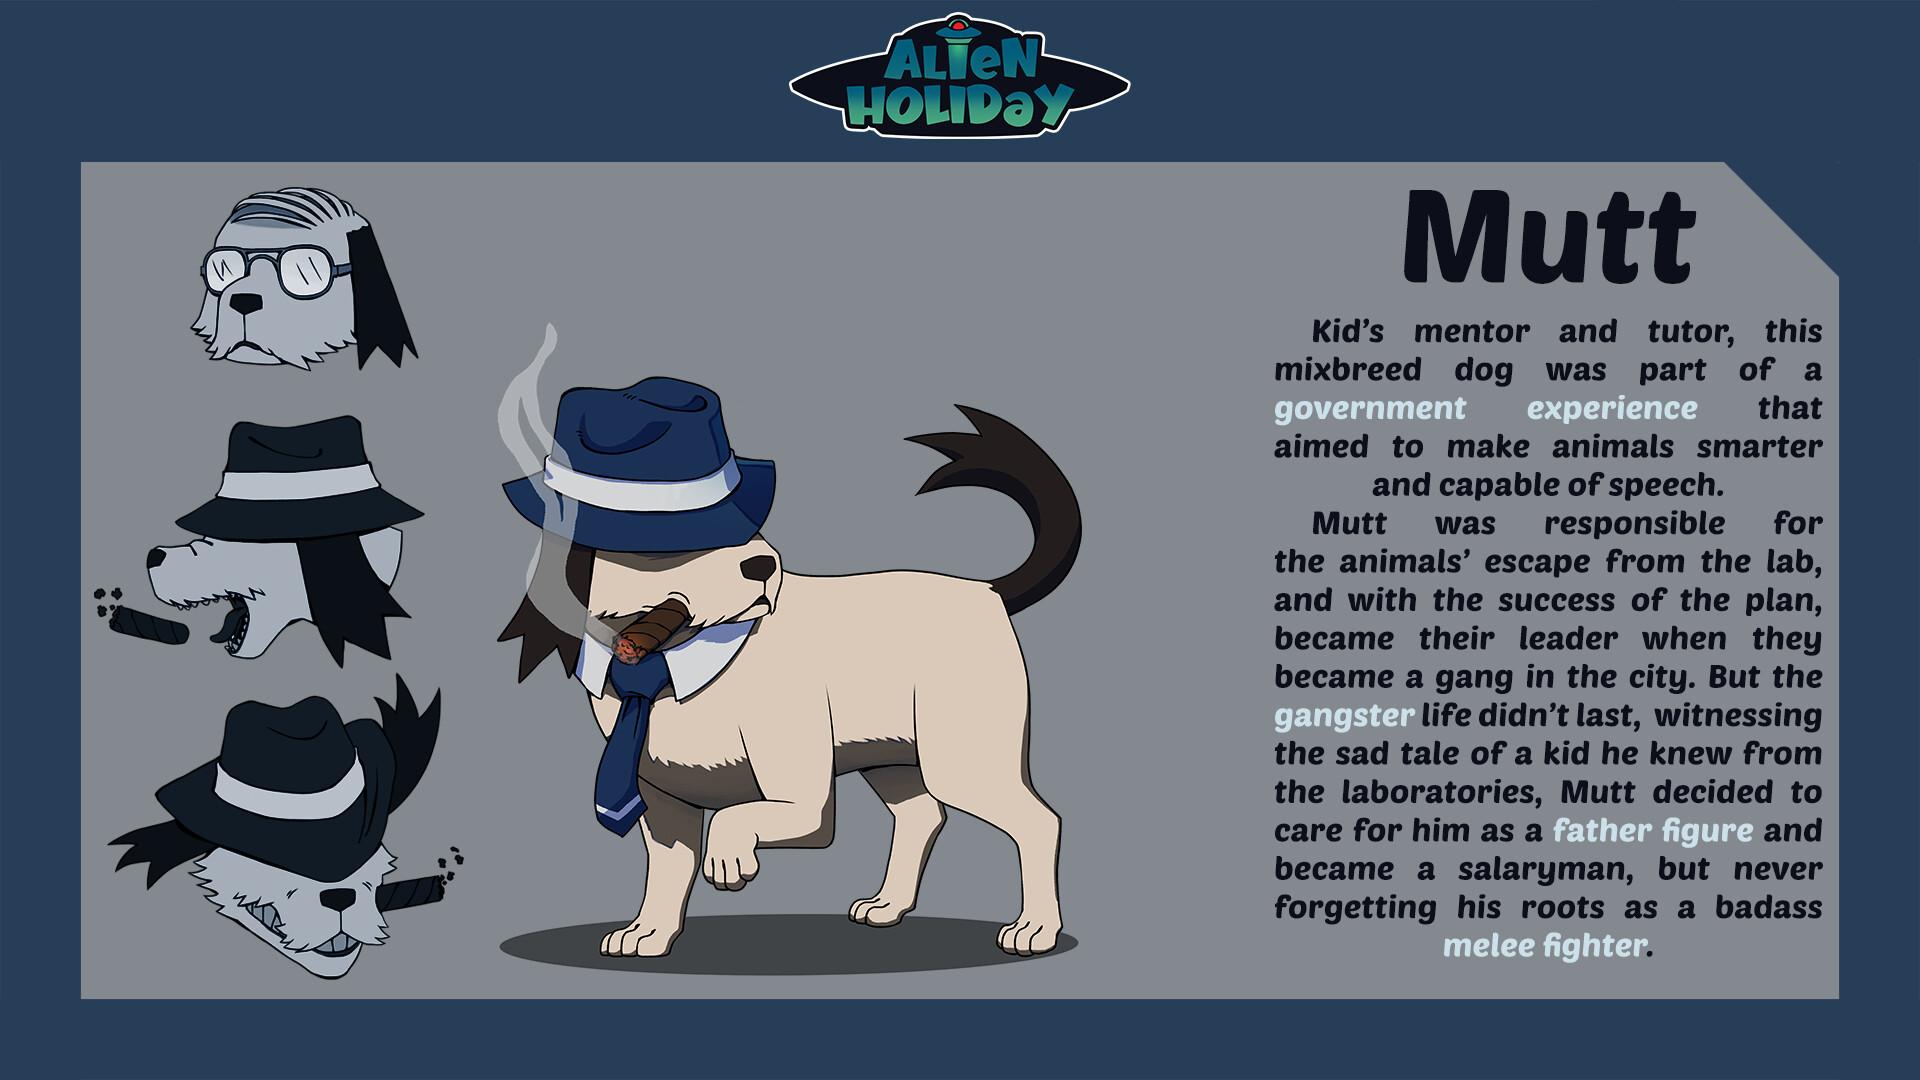 Mutt - Ex-gang member Salaryman